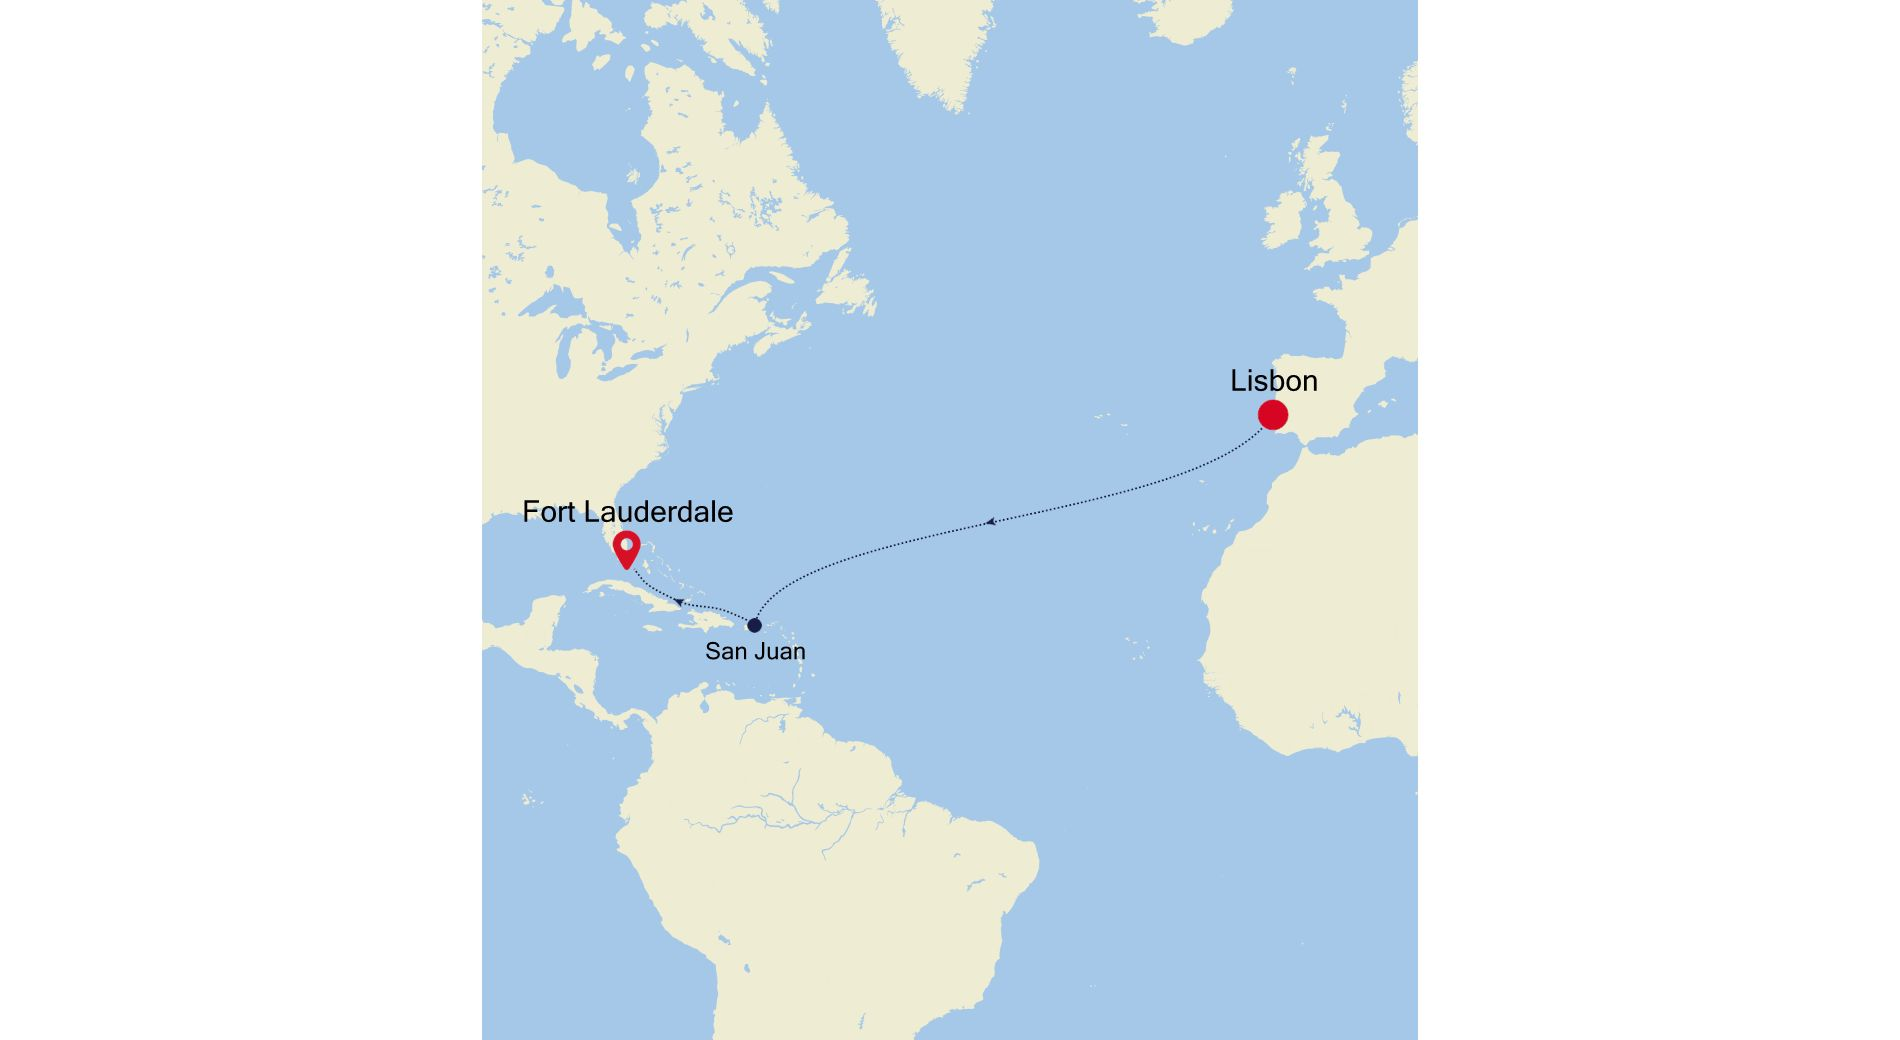 DA211102013 - Lisbon to Fort Lauderdale